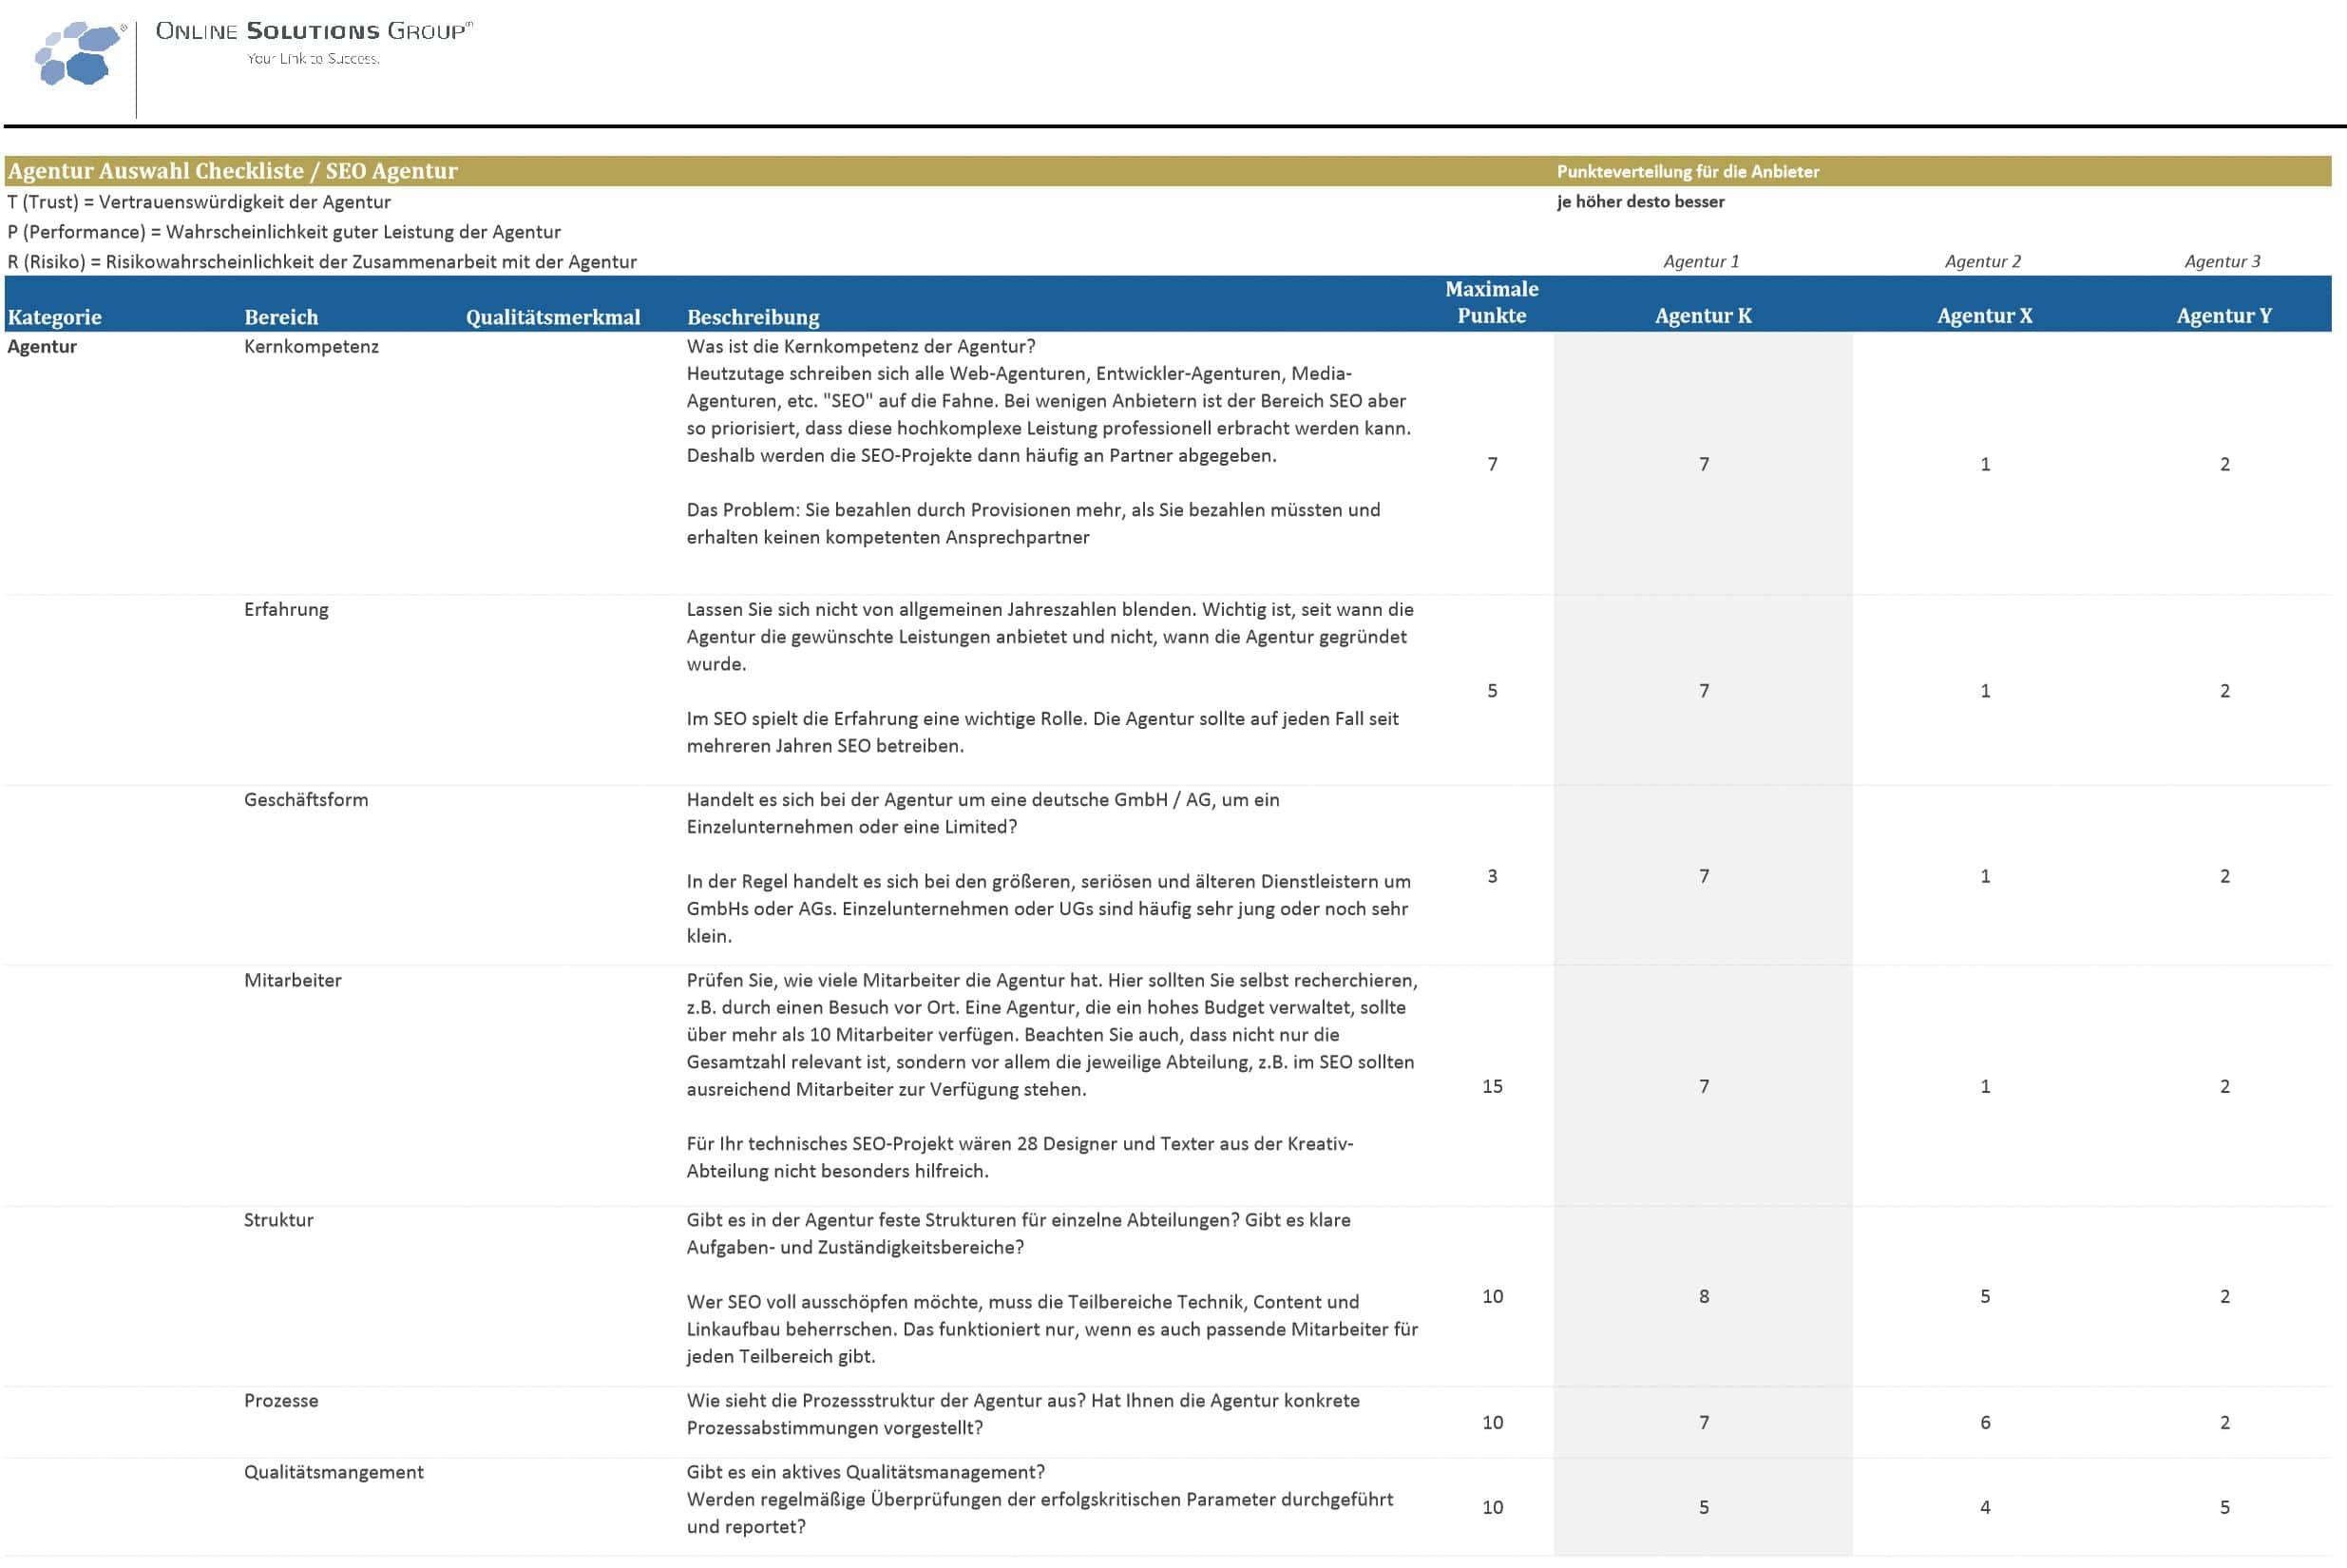 SEO-Agentur-Auswahl-Excel